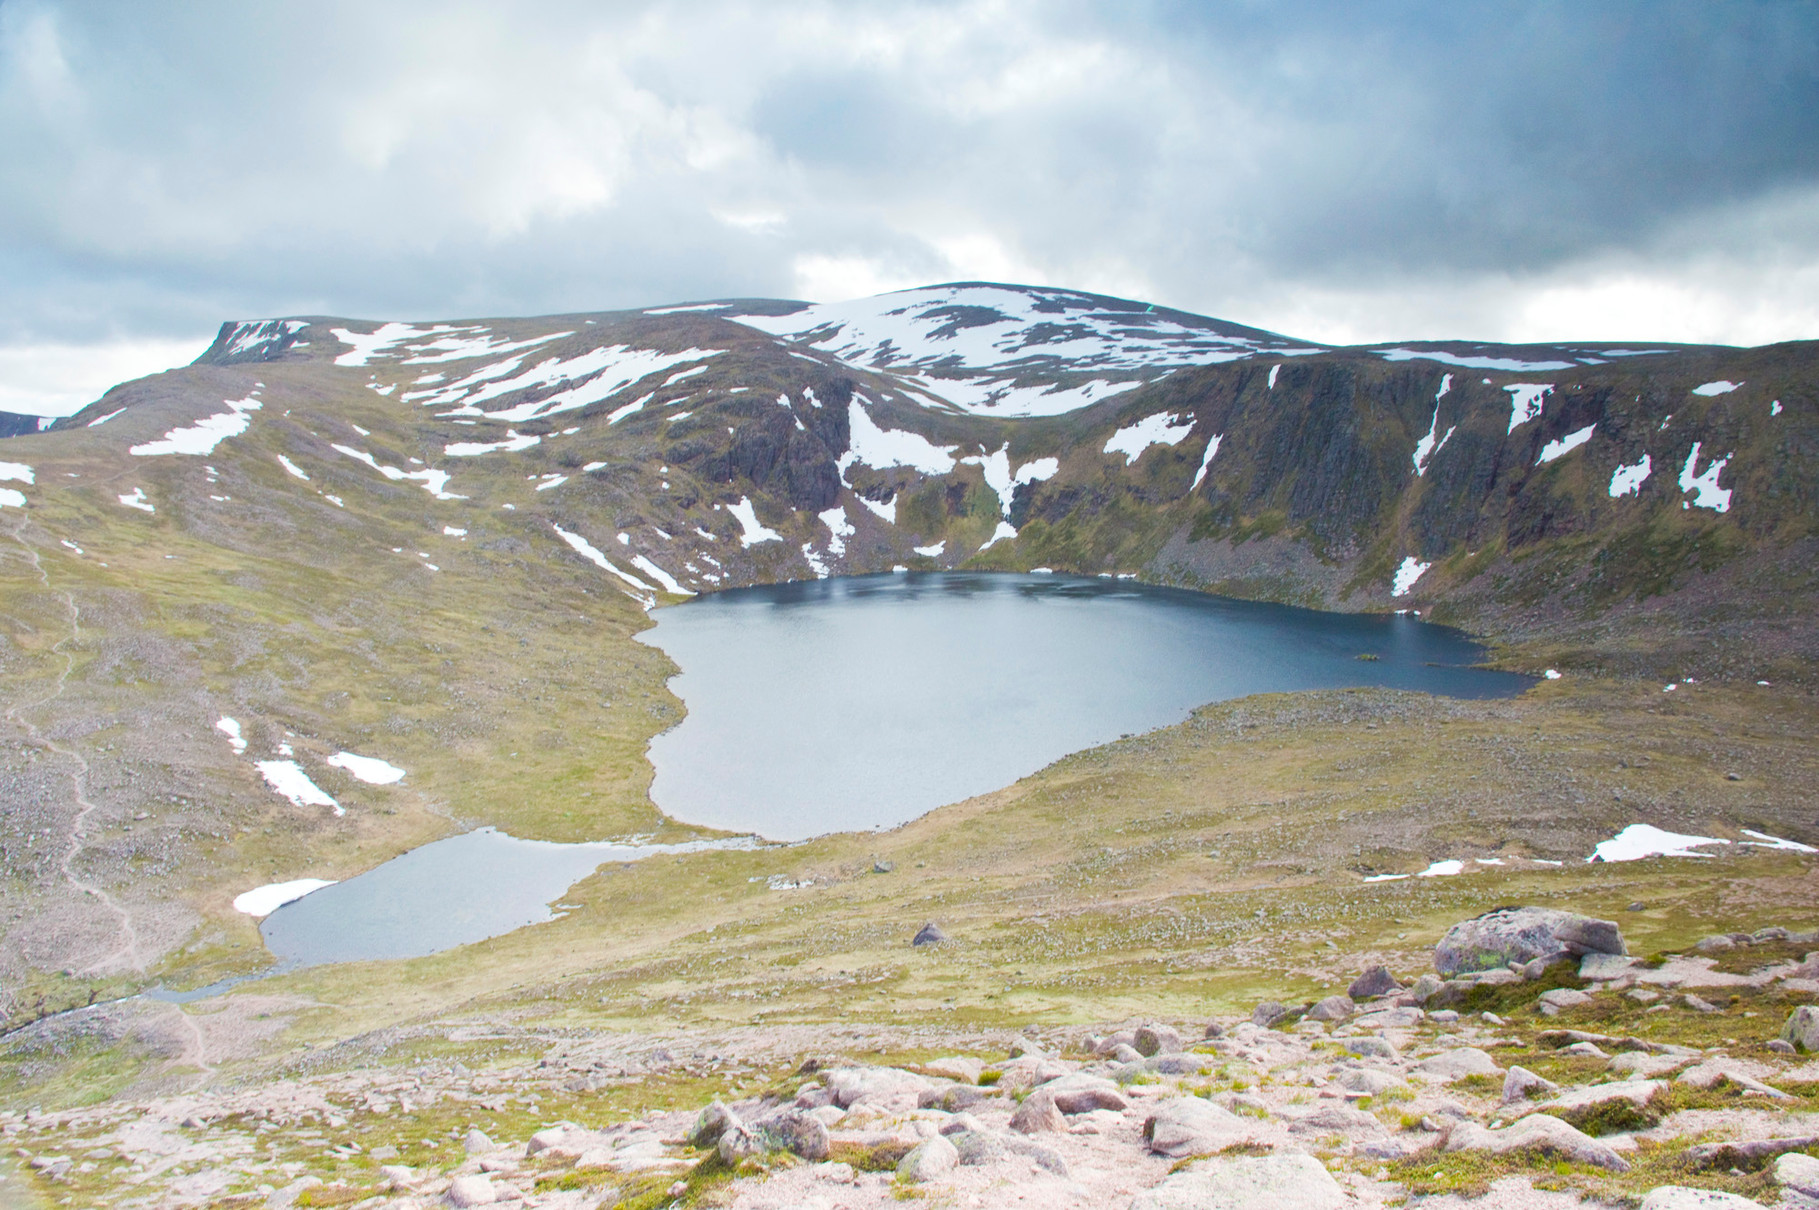 Ben Macdui, Loch Etachan